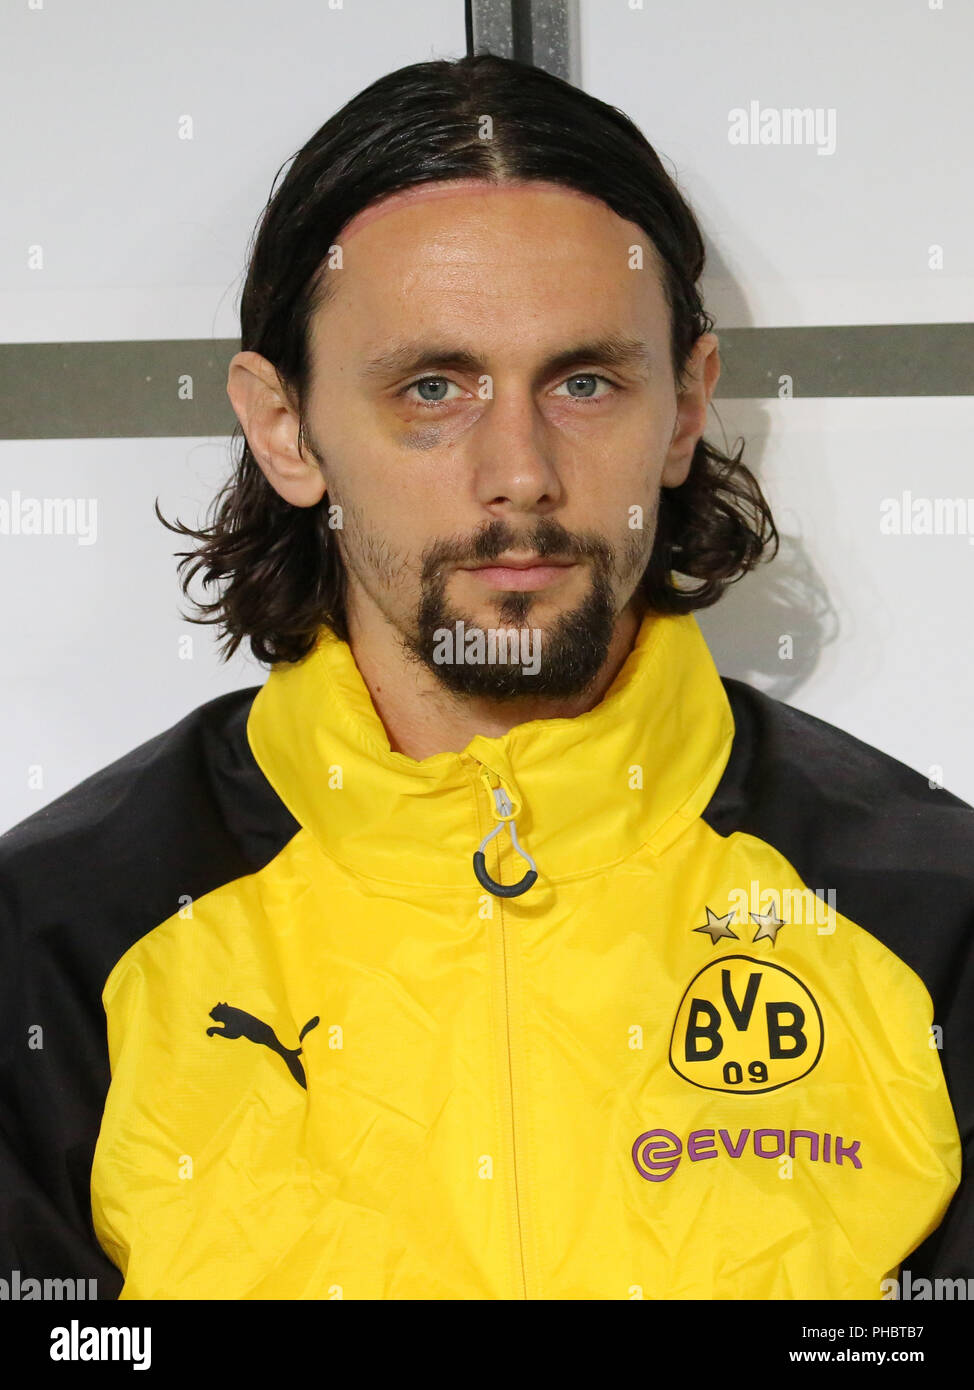 Neven Subotic ( Borussia Dortmund) - Stock Image